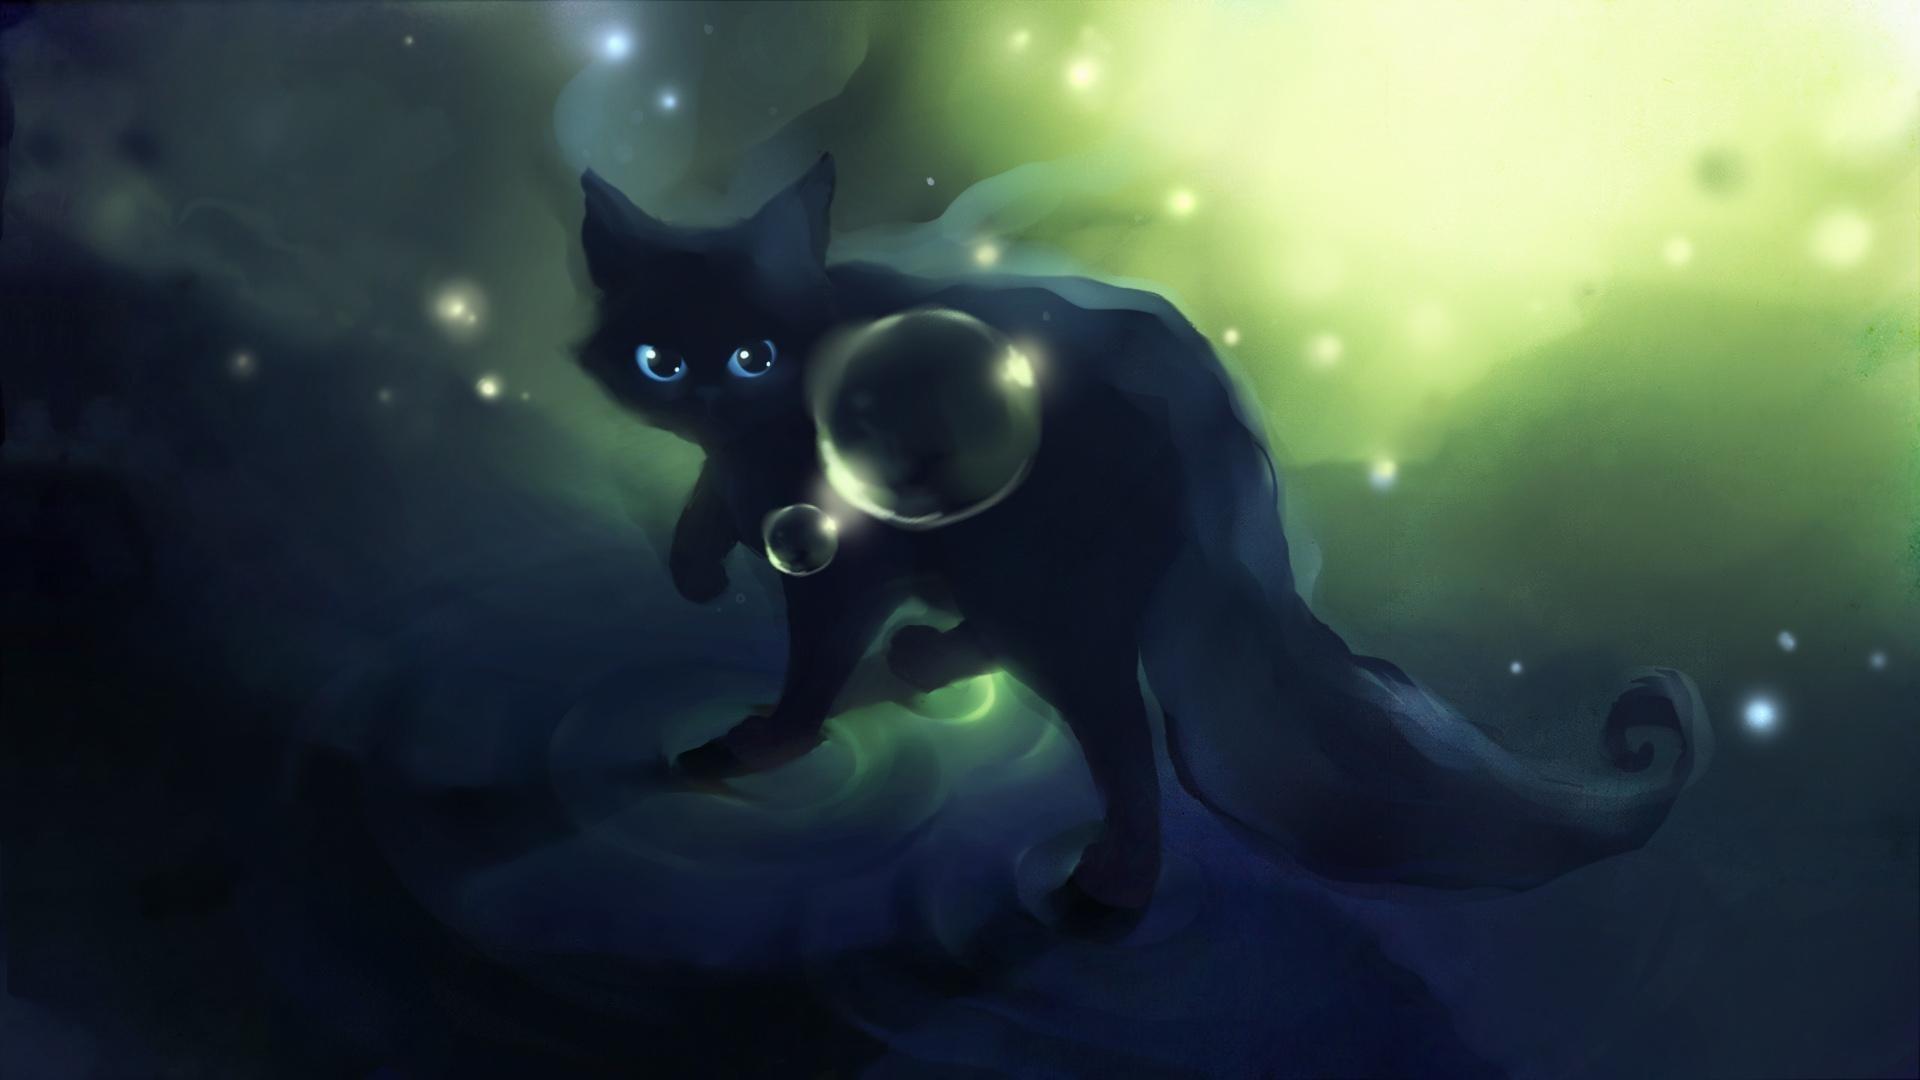 Res: 1920x1080,  wallpaper.wiki-Anime-Black-Cat-Wallpaper--PIC